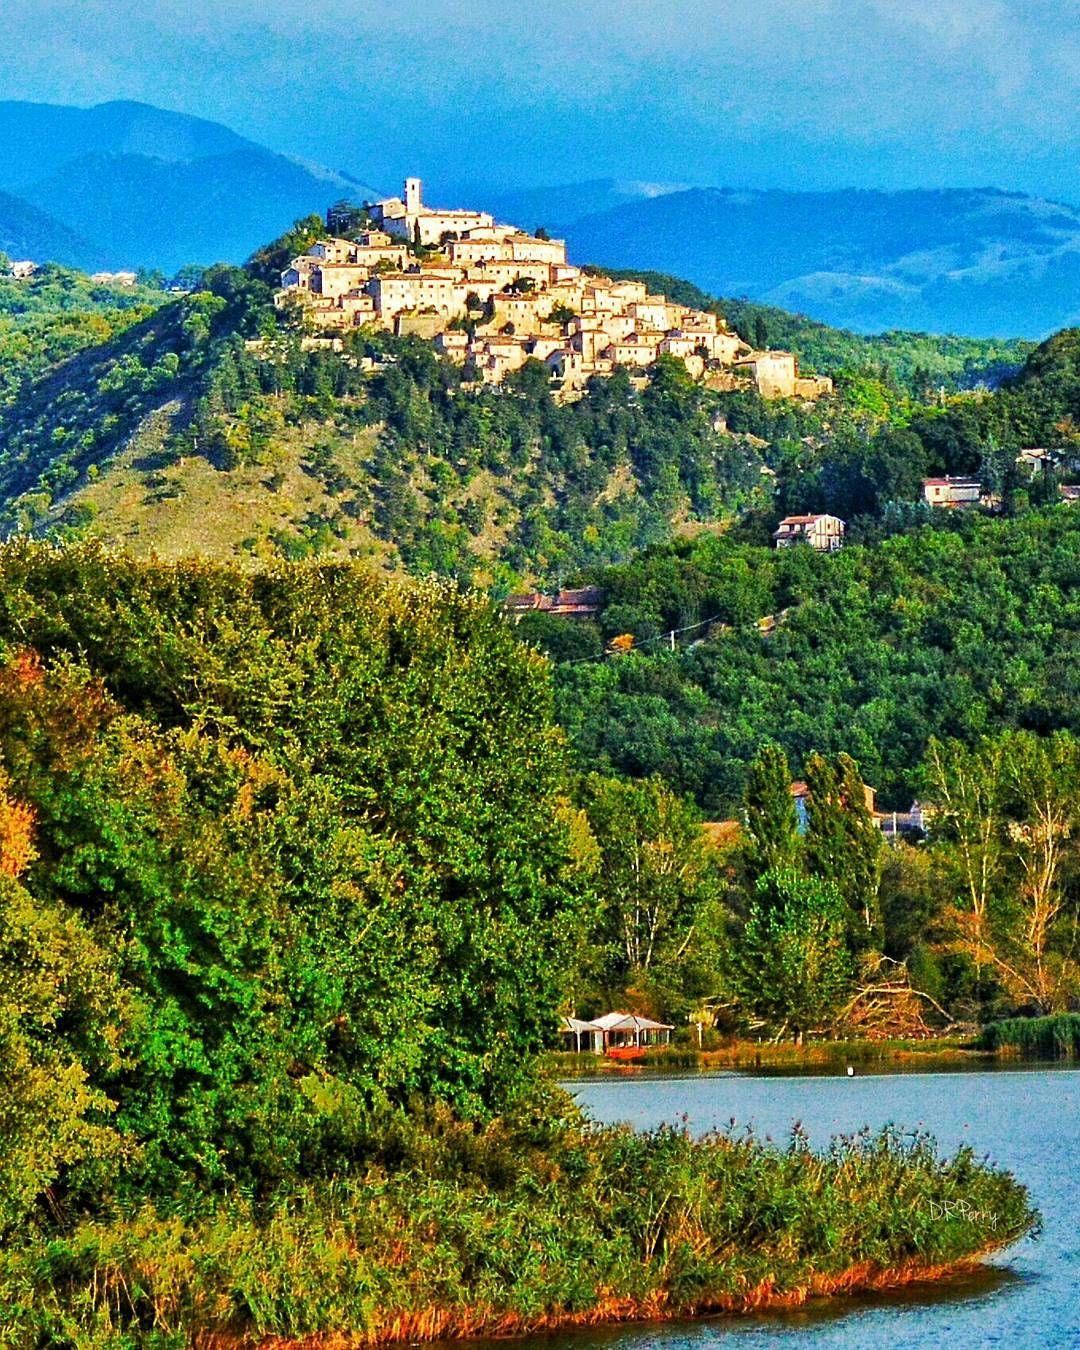 Village of Labro, Italy  -